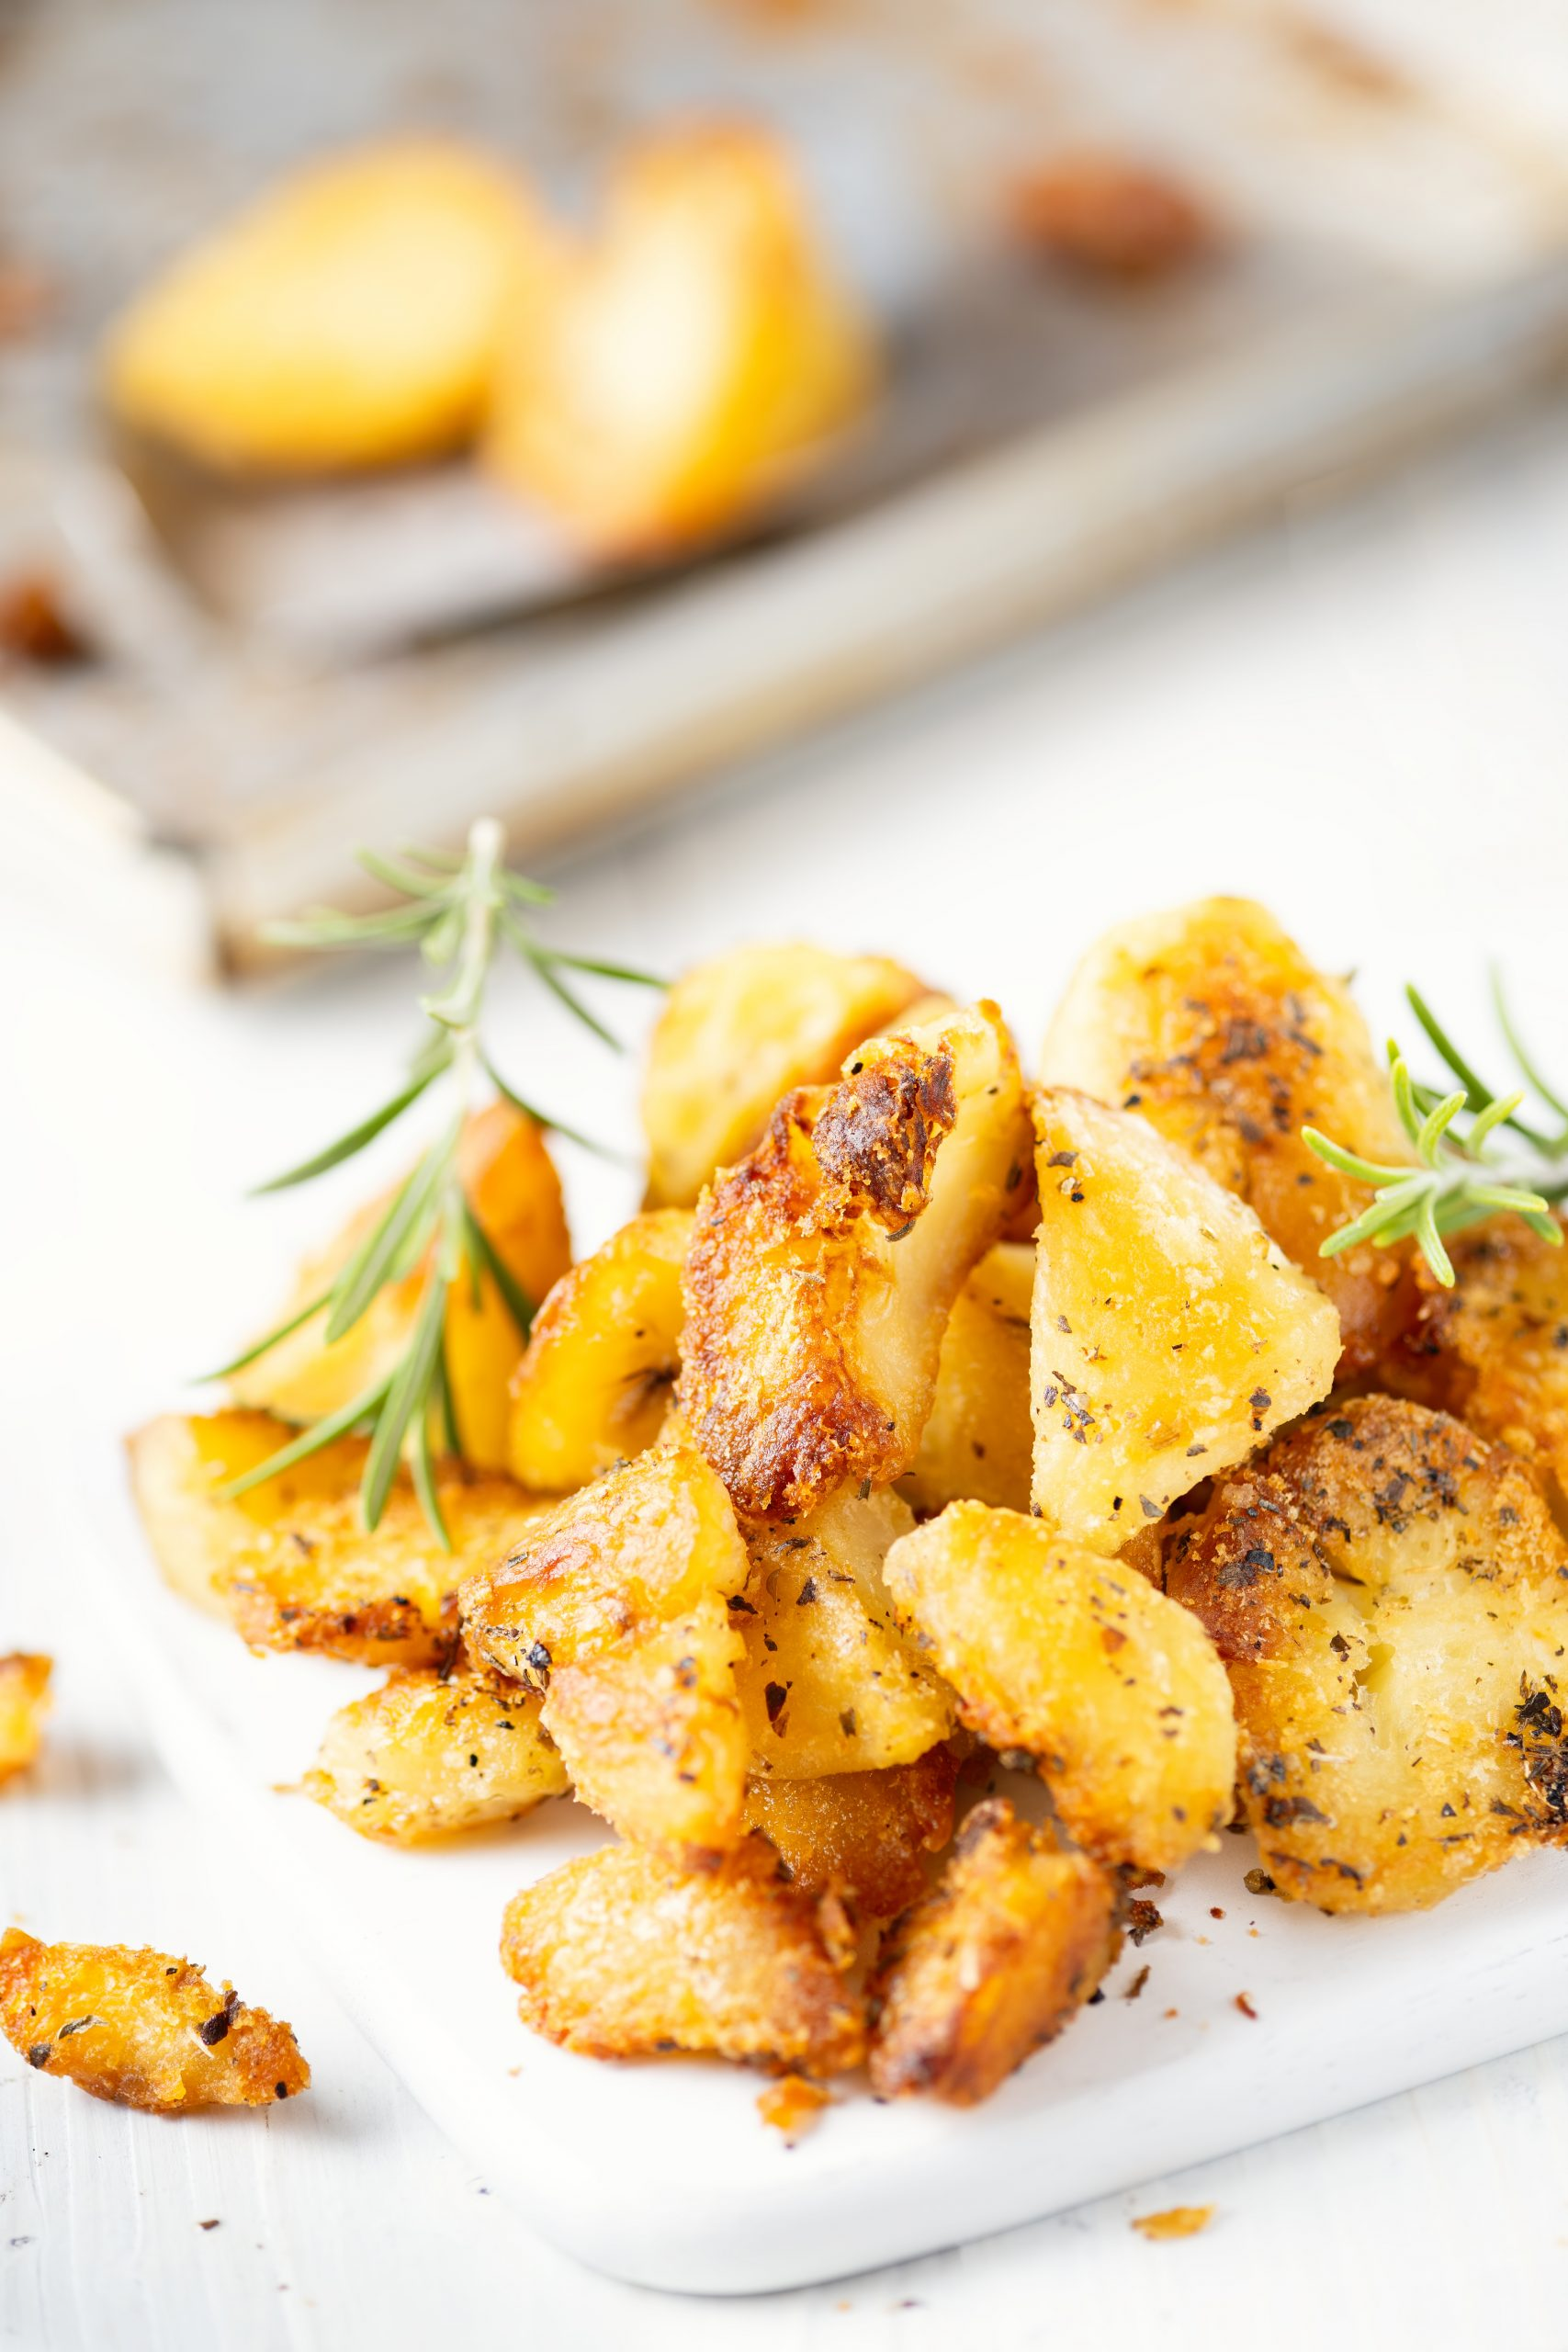 Golden english roasted potatoes